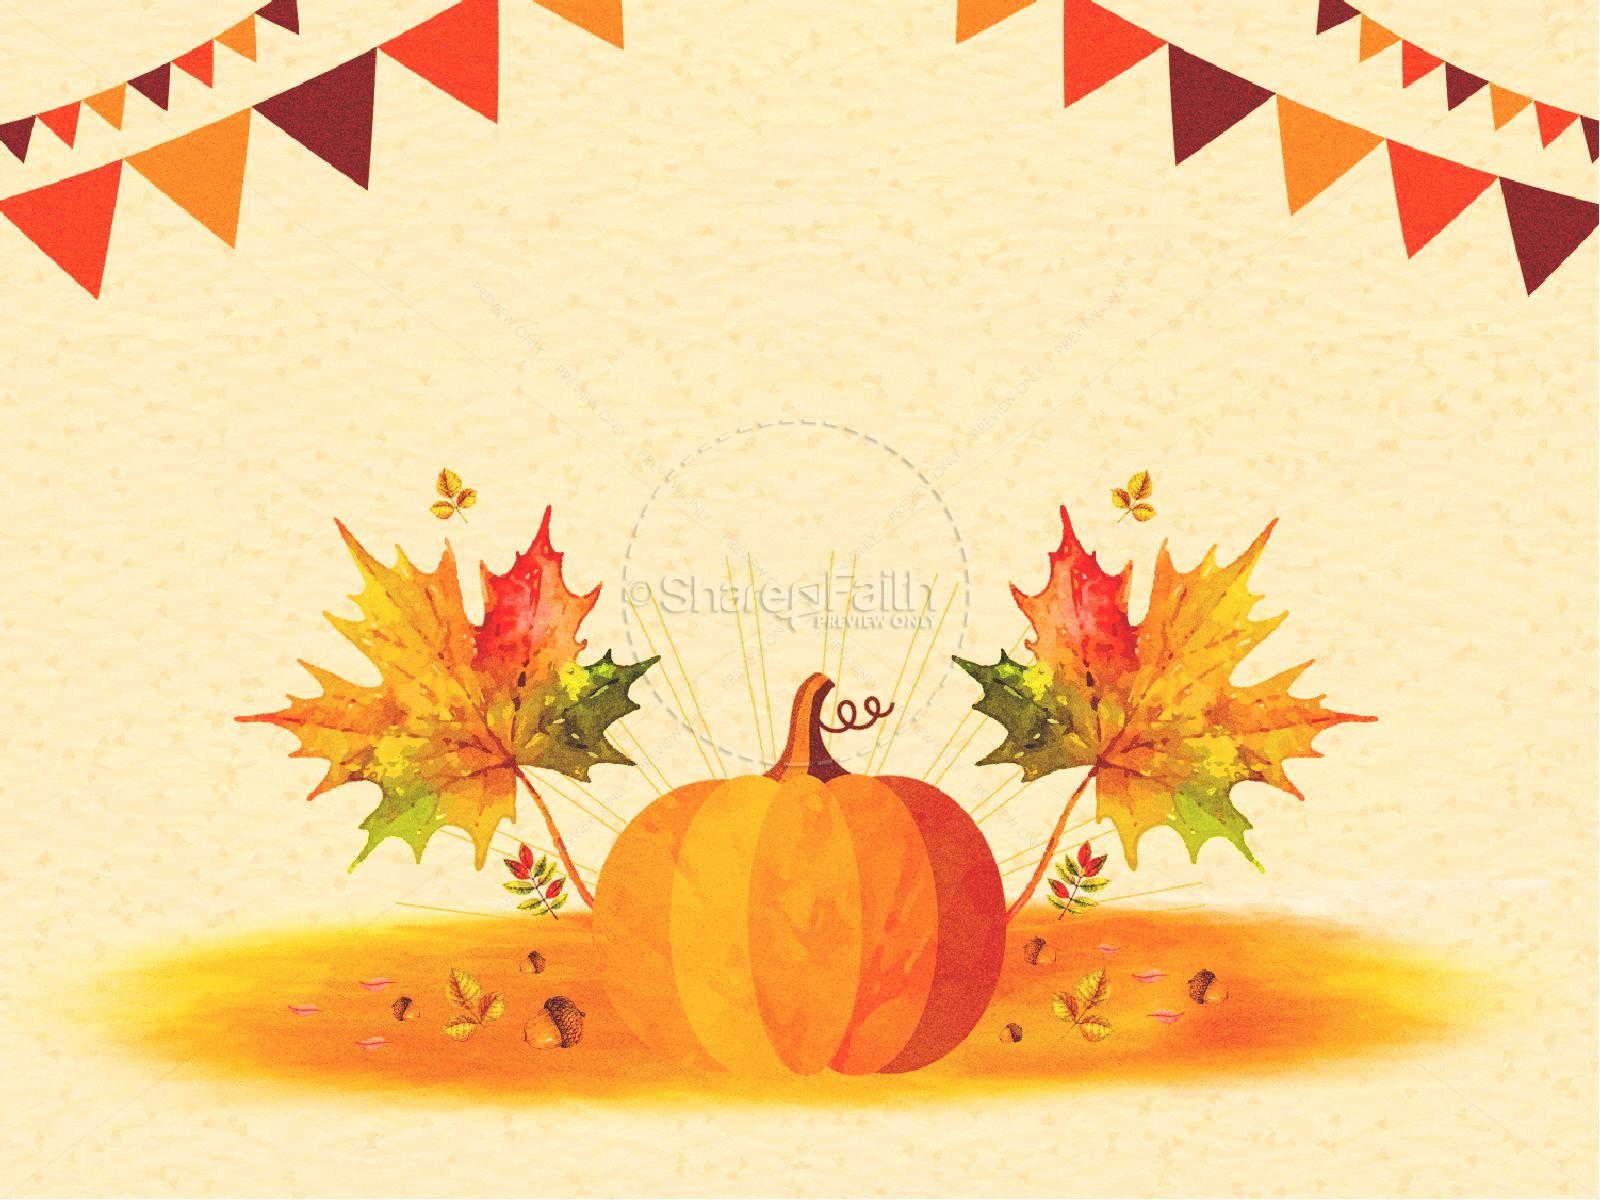 Harvest Party Pumpkin Graphic | slide 5